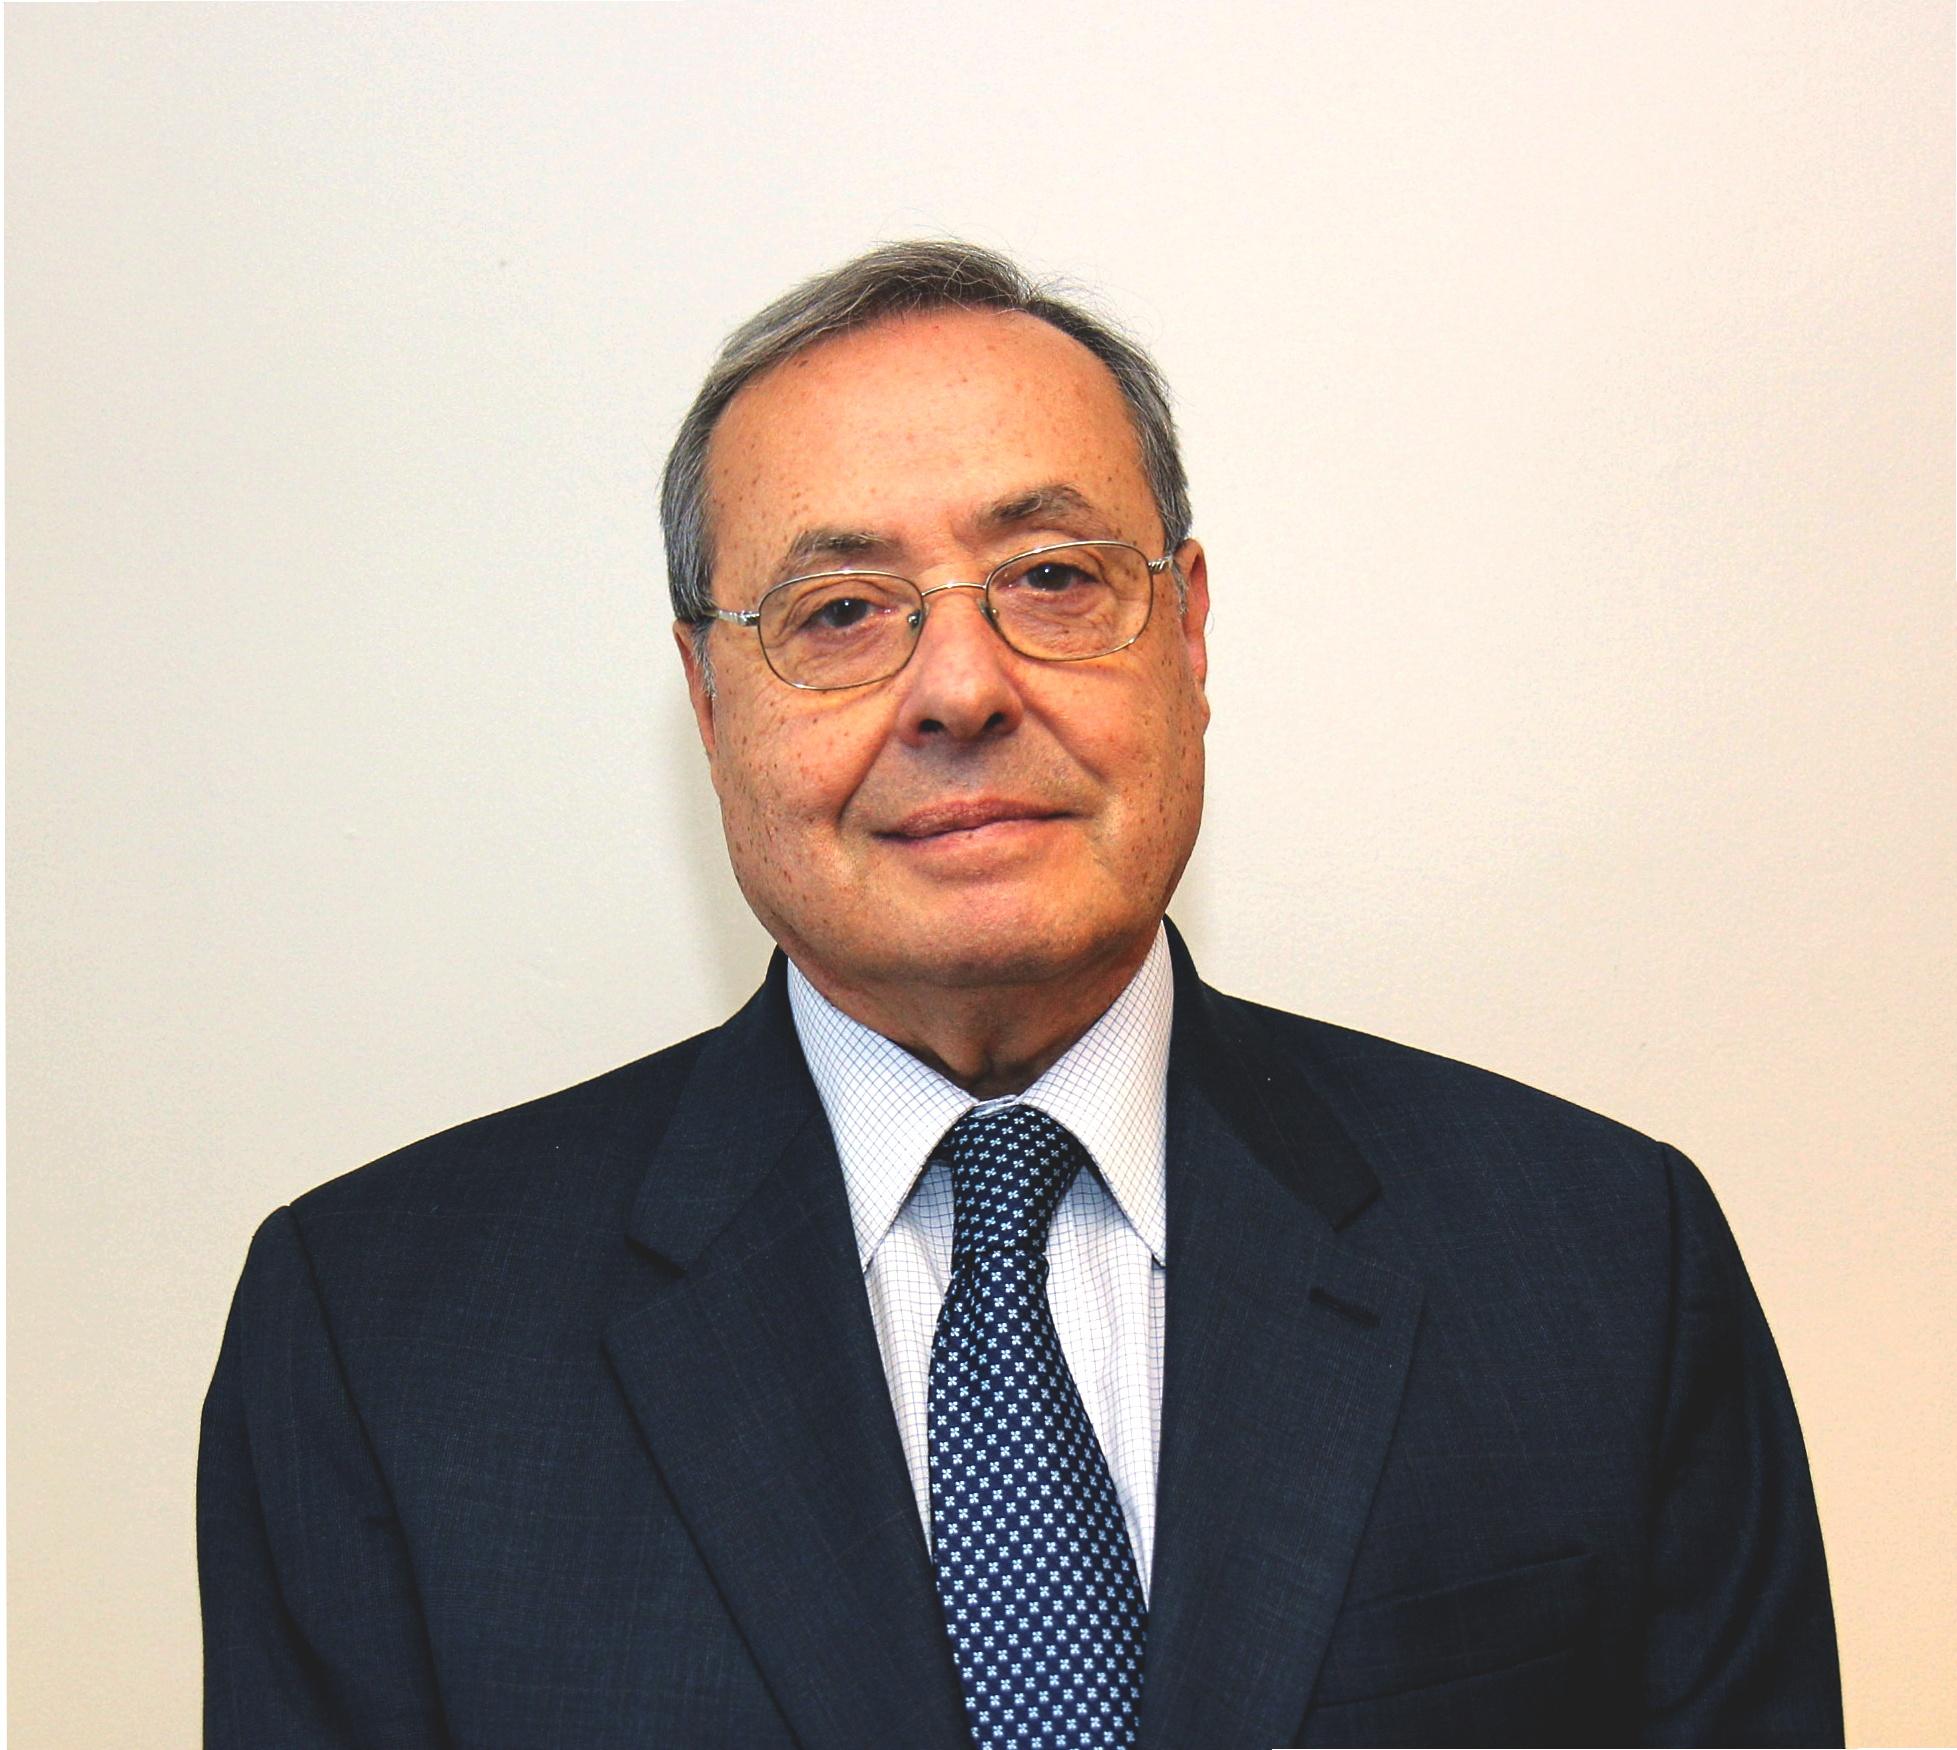 Ambassador Carlos Gianelli Uruguay